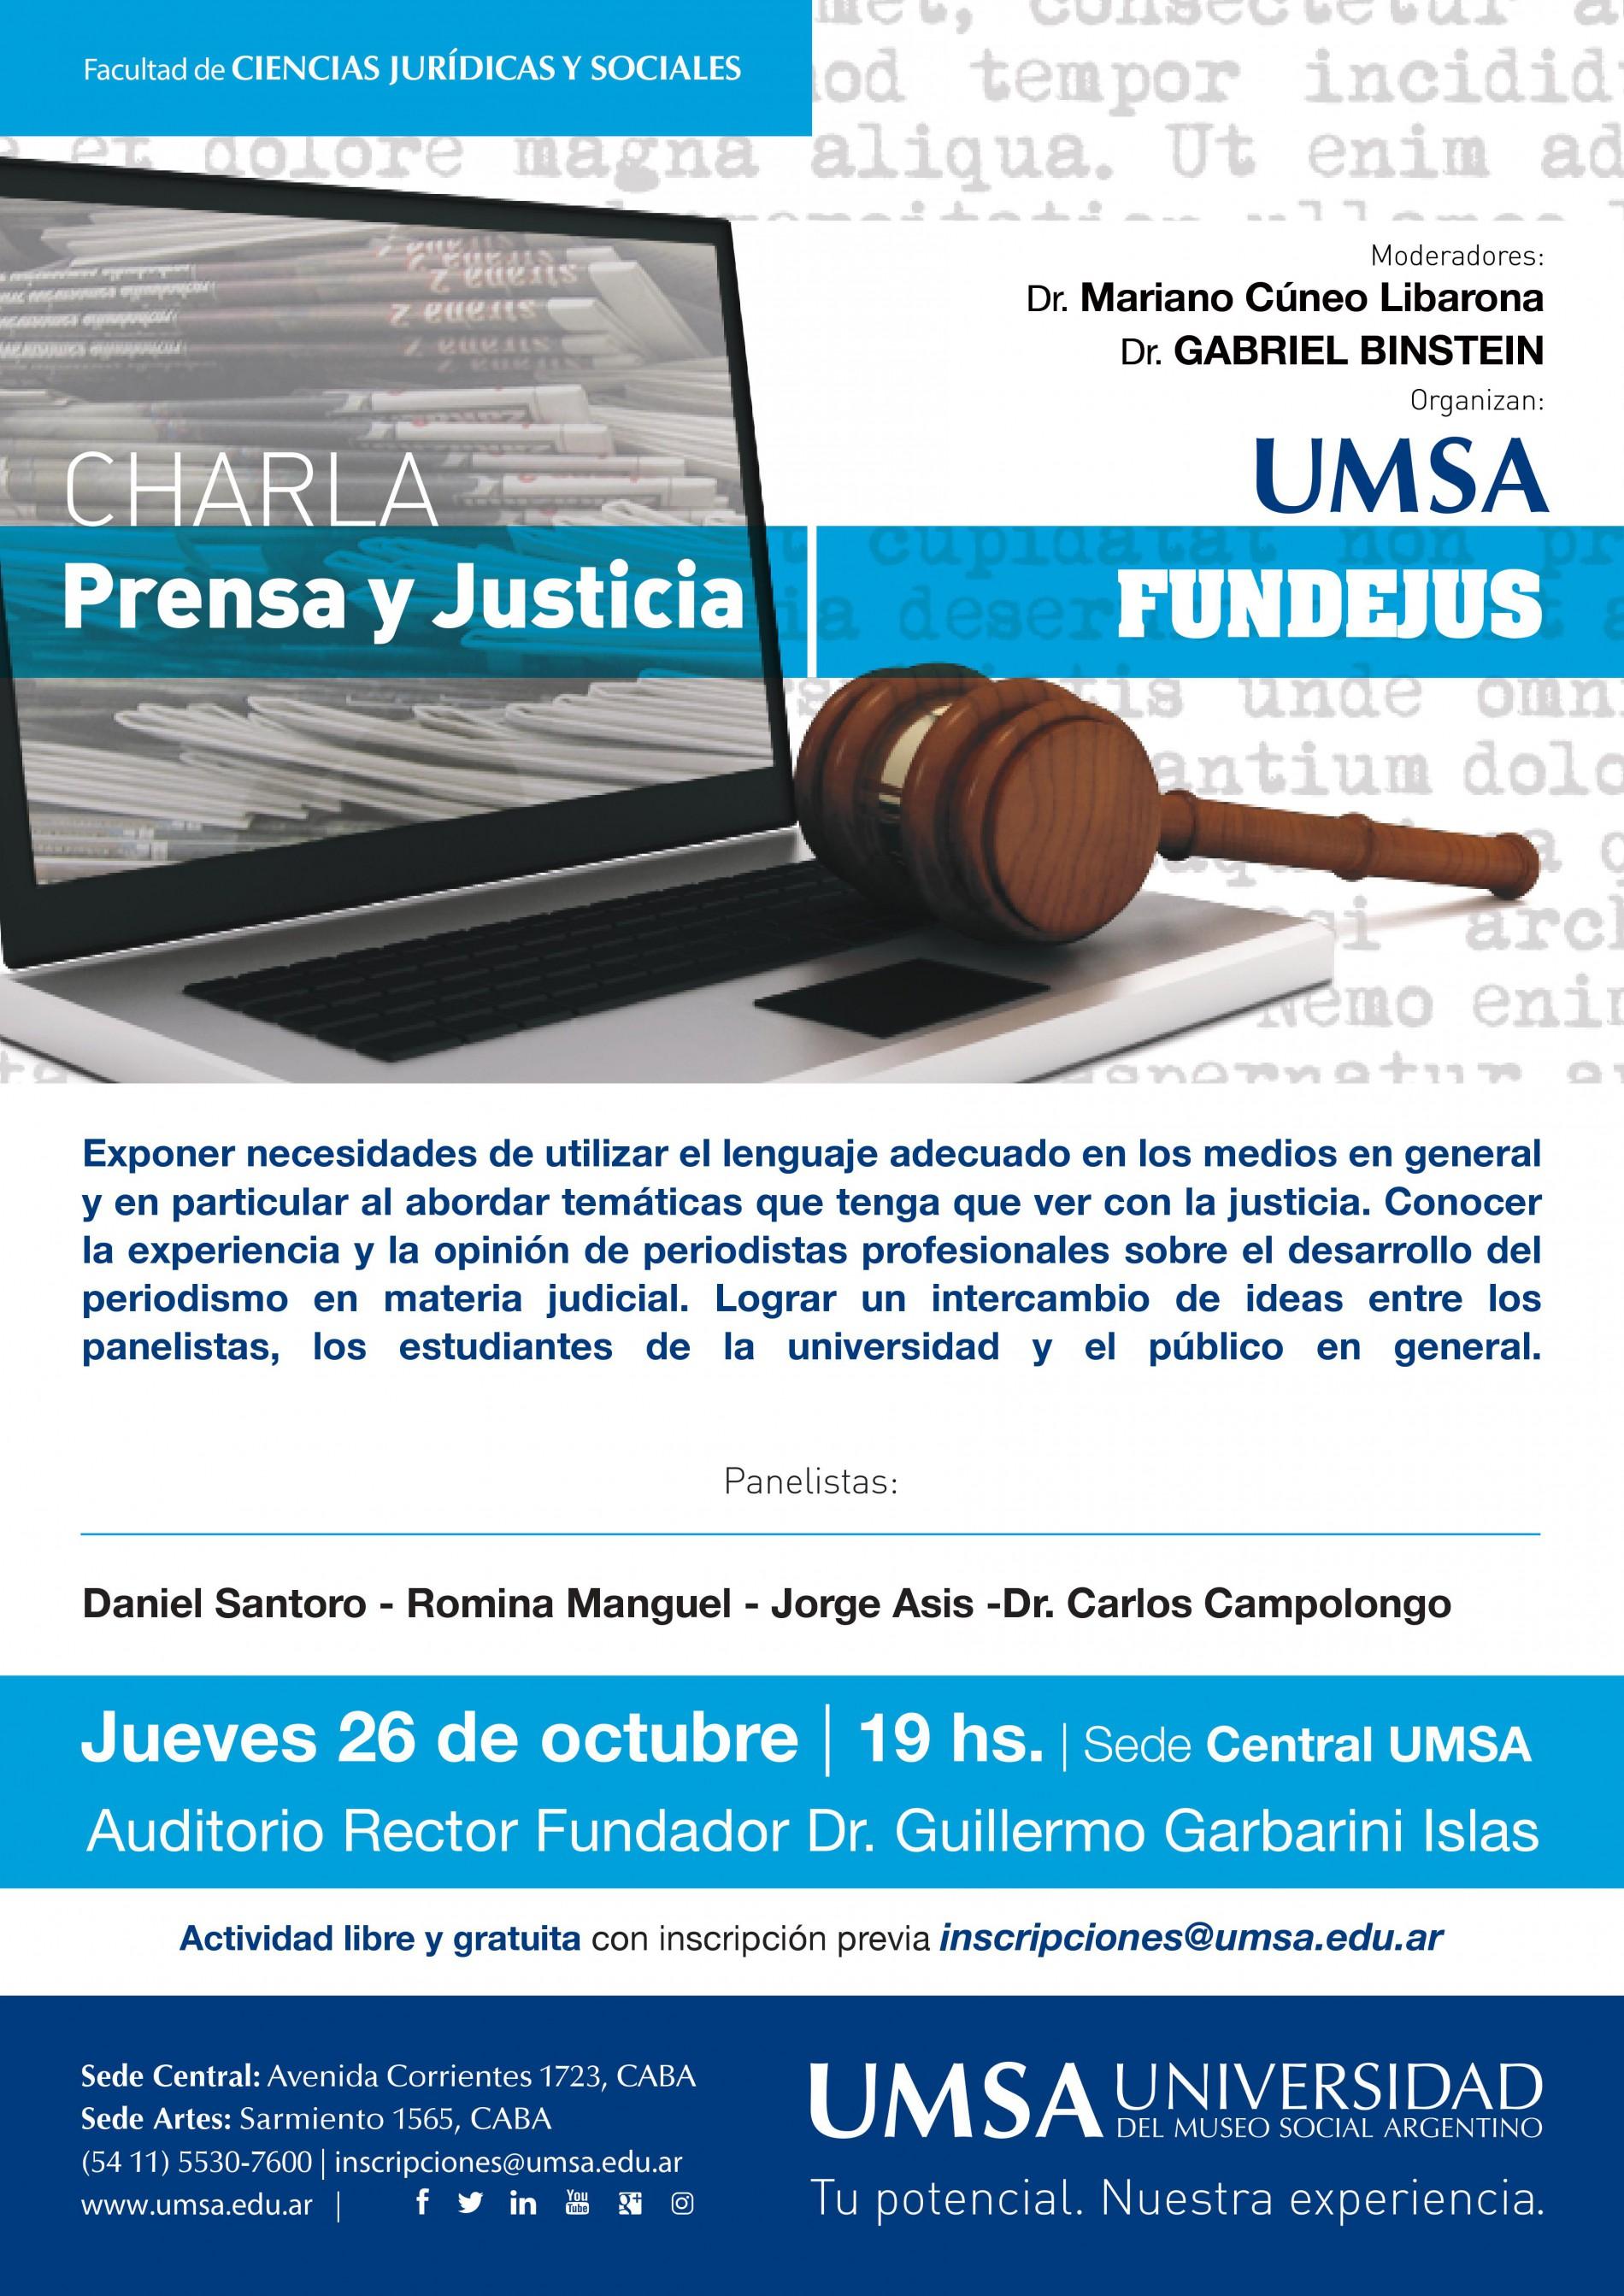 Charla PRENSA Y JUSTICIA